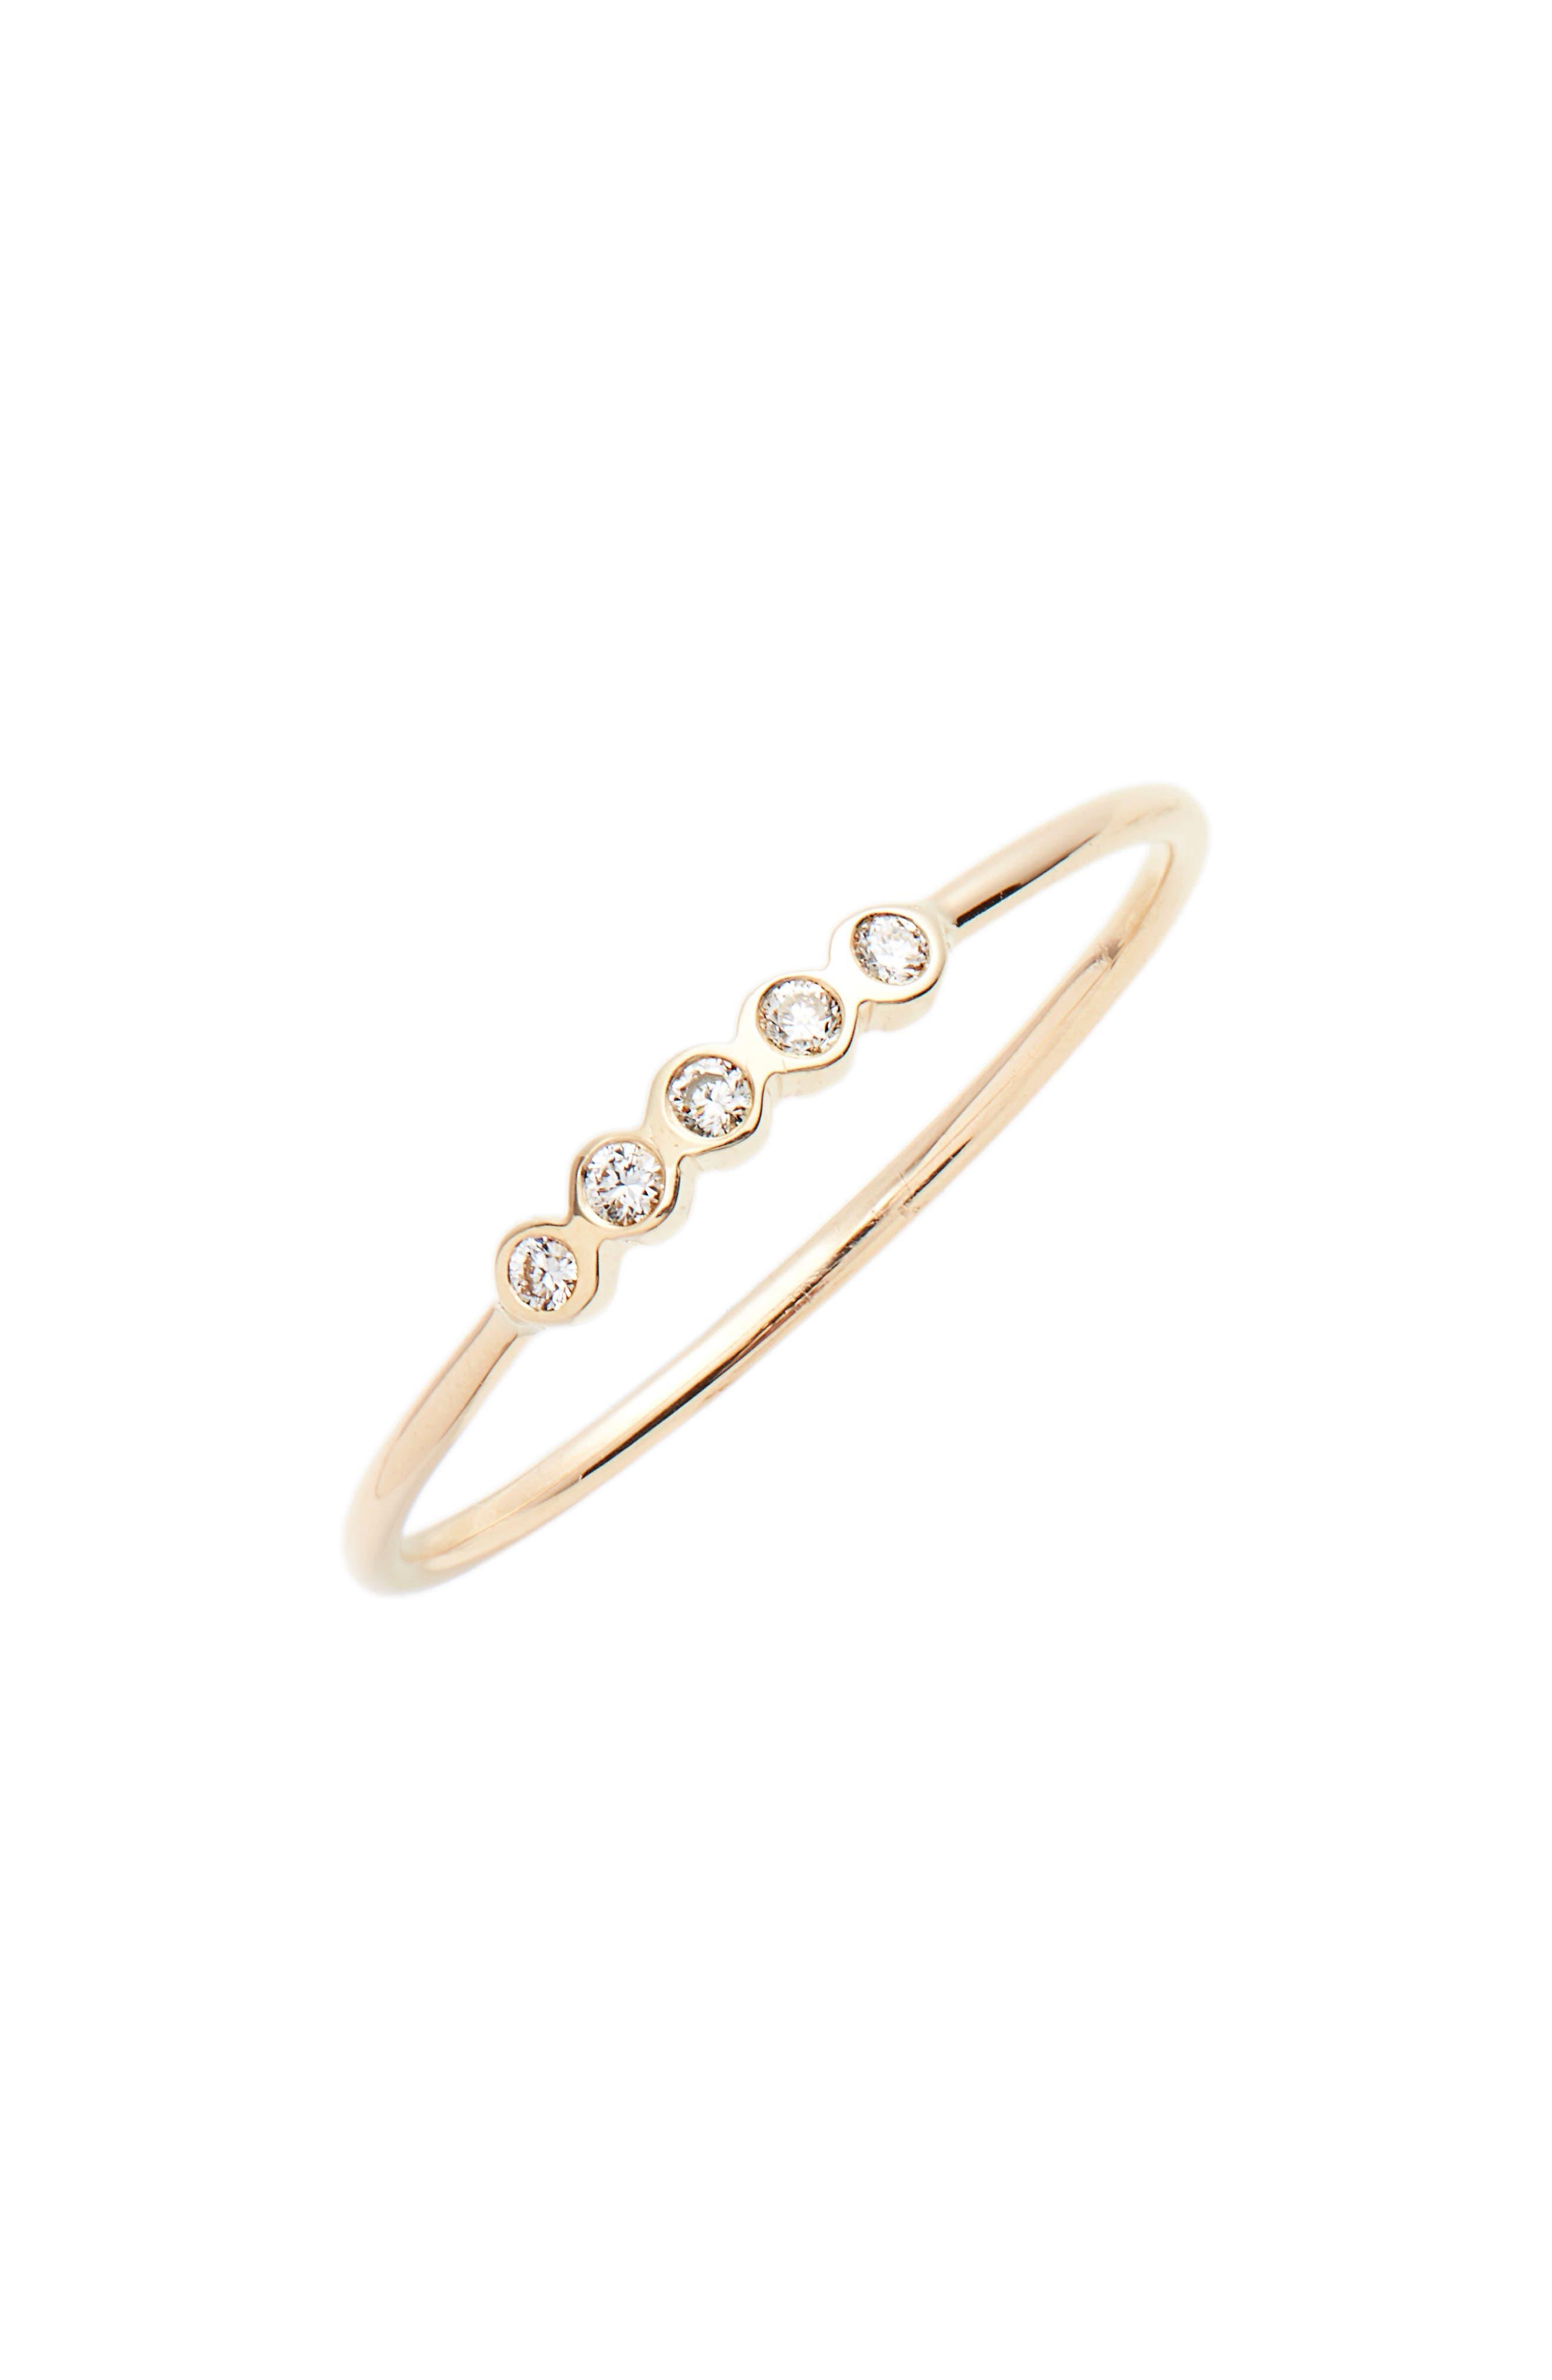 5-Diamond Bezel Stock Ring,                             Main thumbnail 1, color,                             Yellow Gold